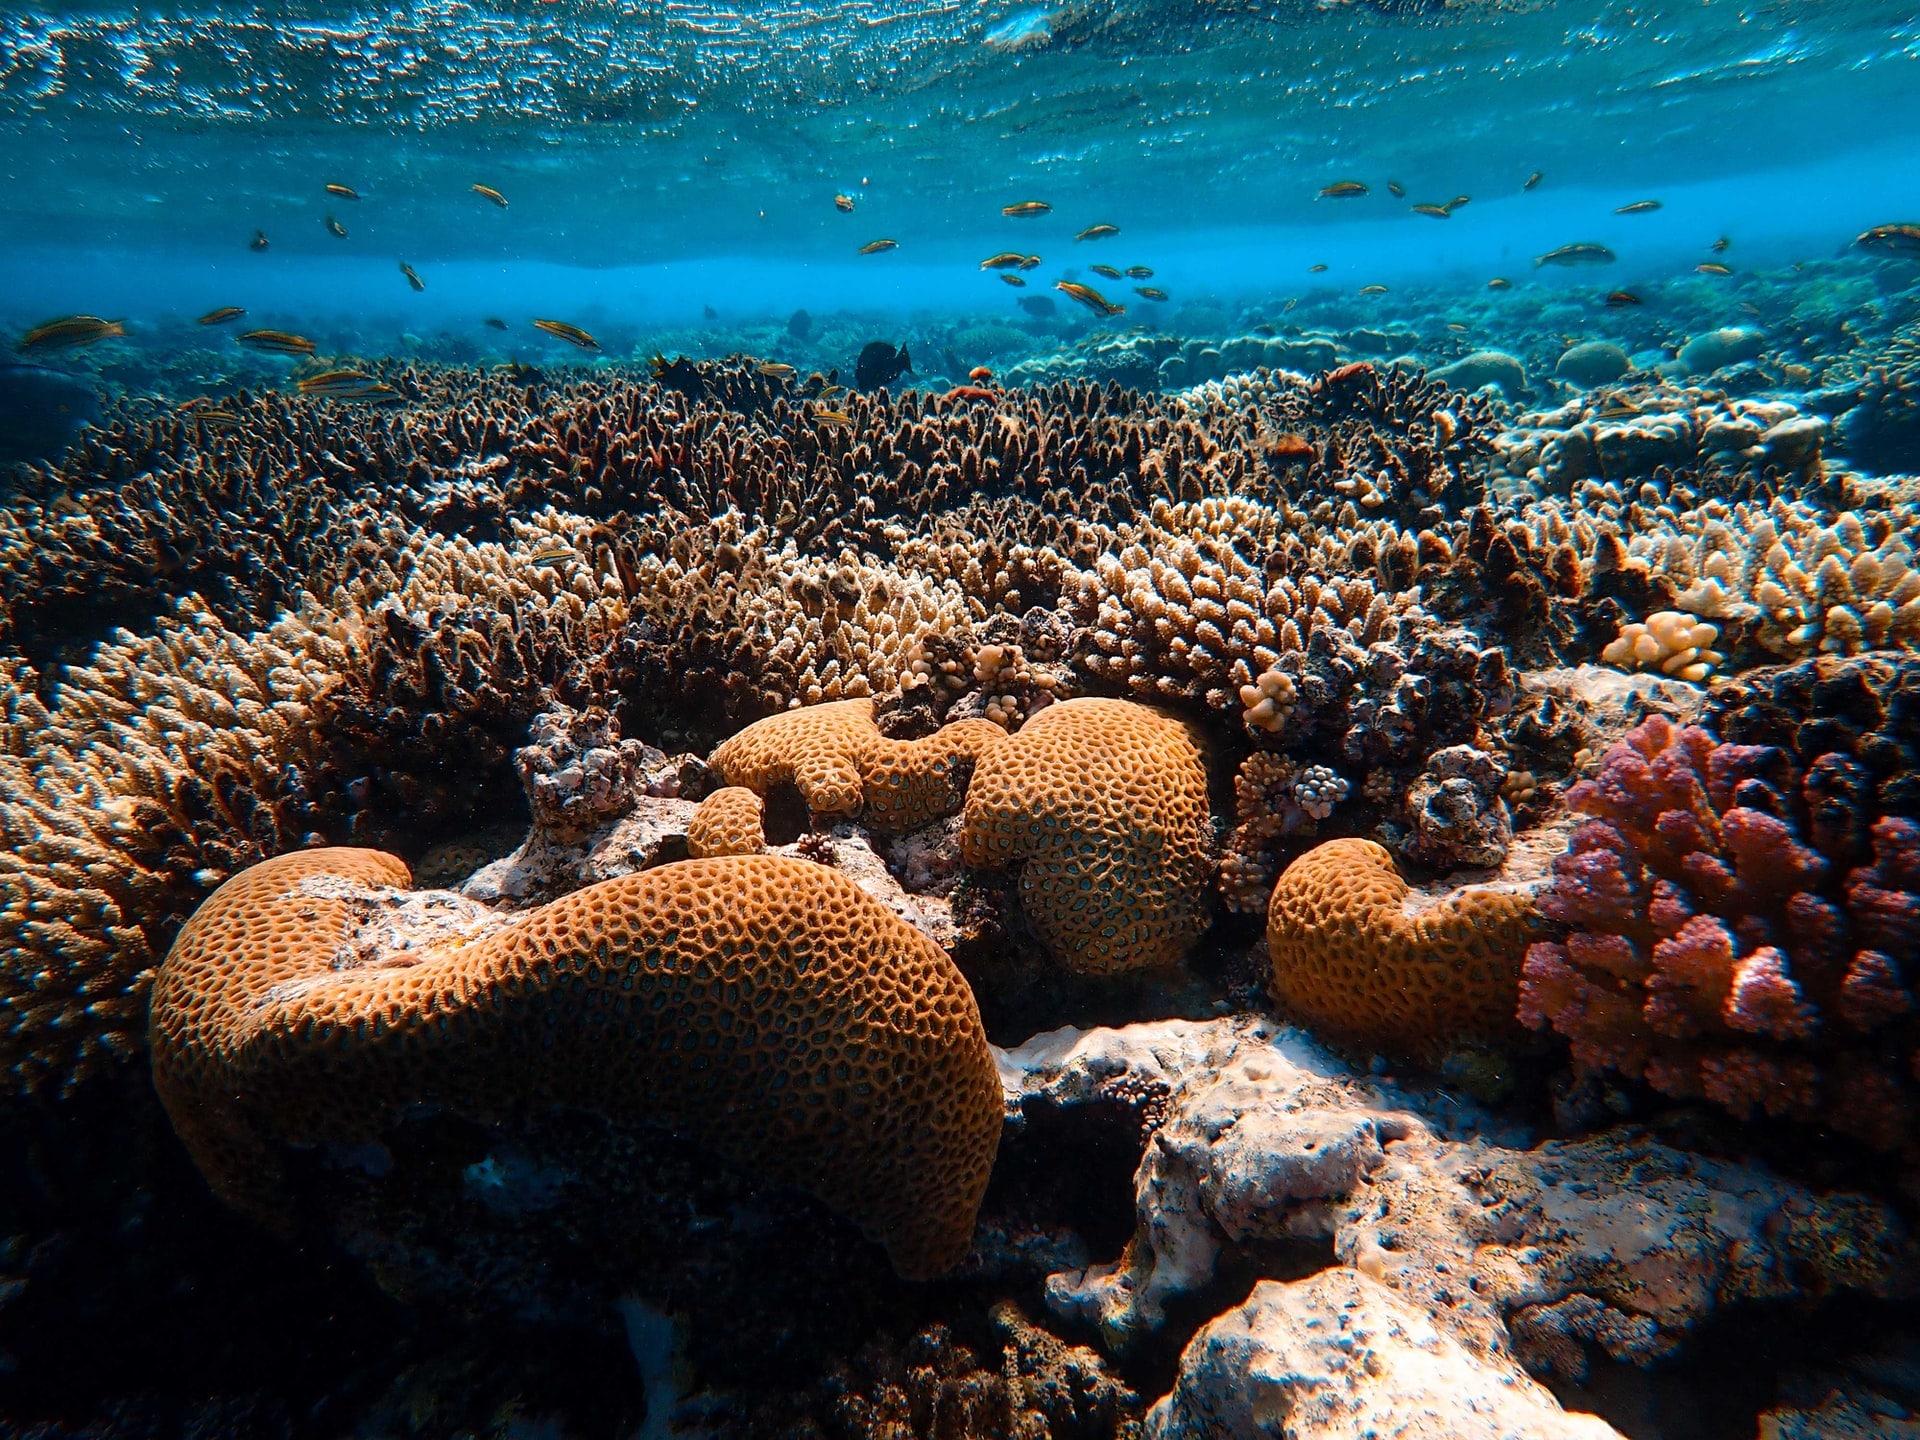 korallfeheredes korallzatony megfigyelo rendszer muhold